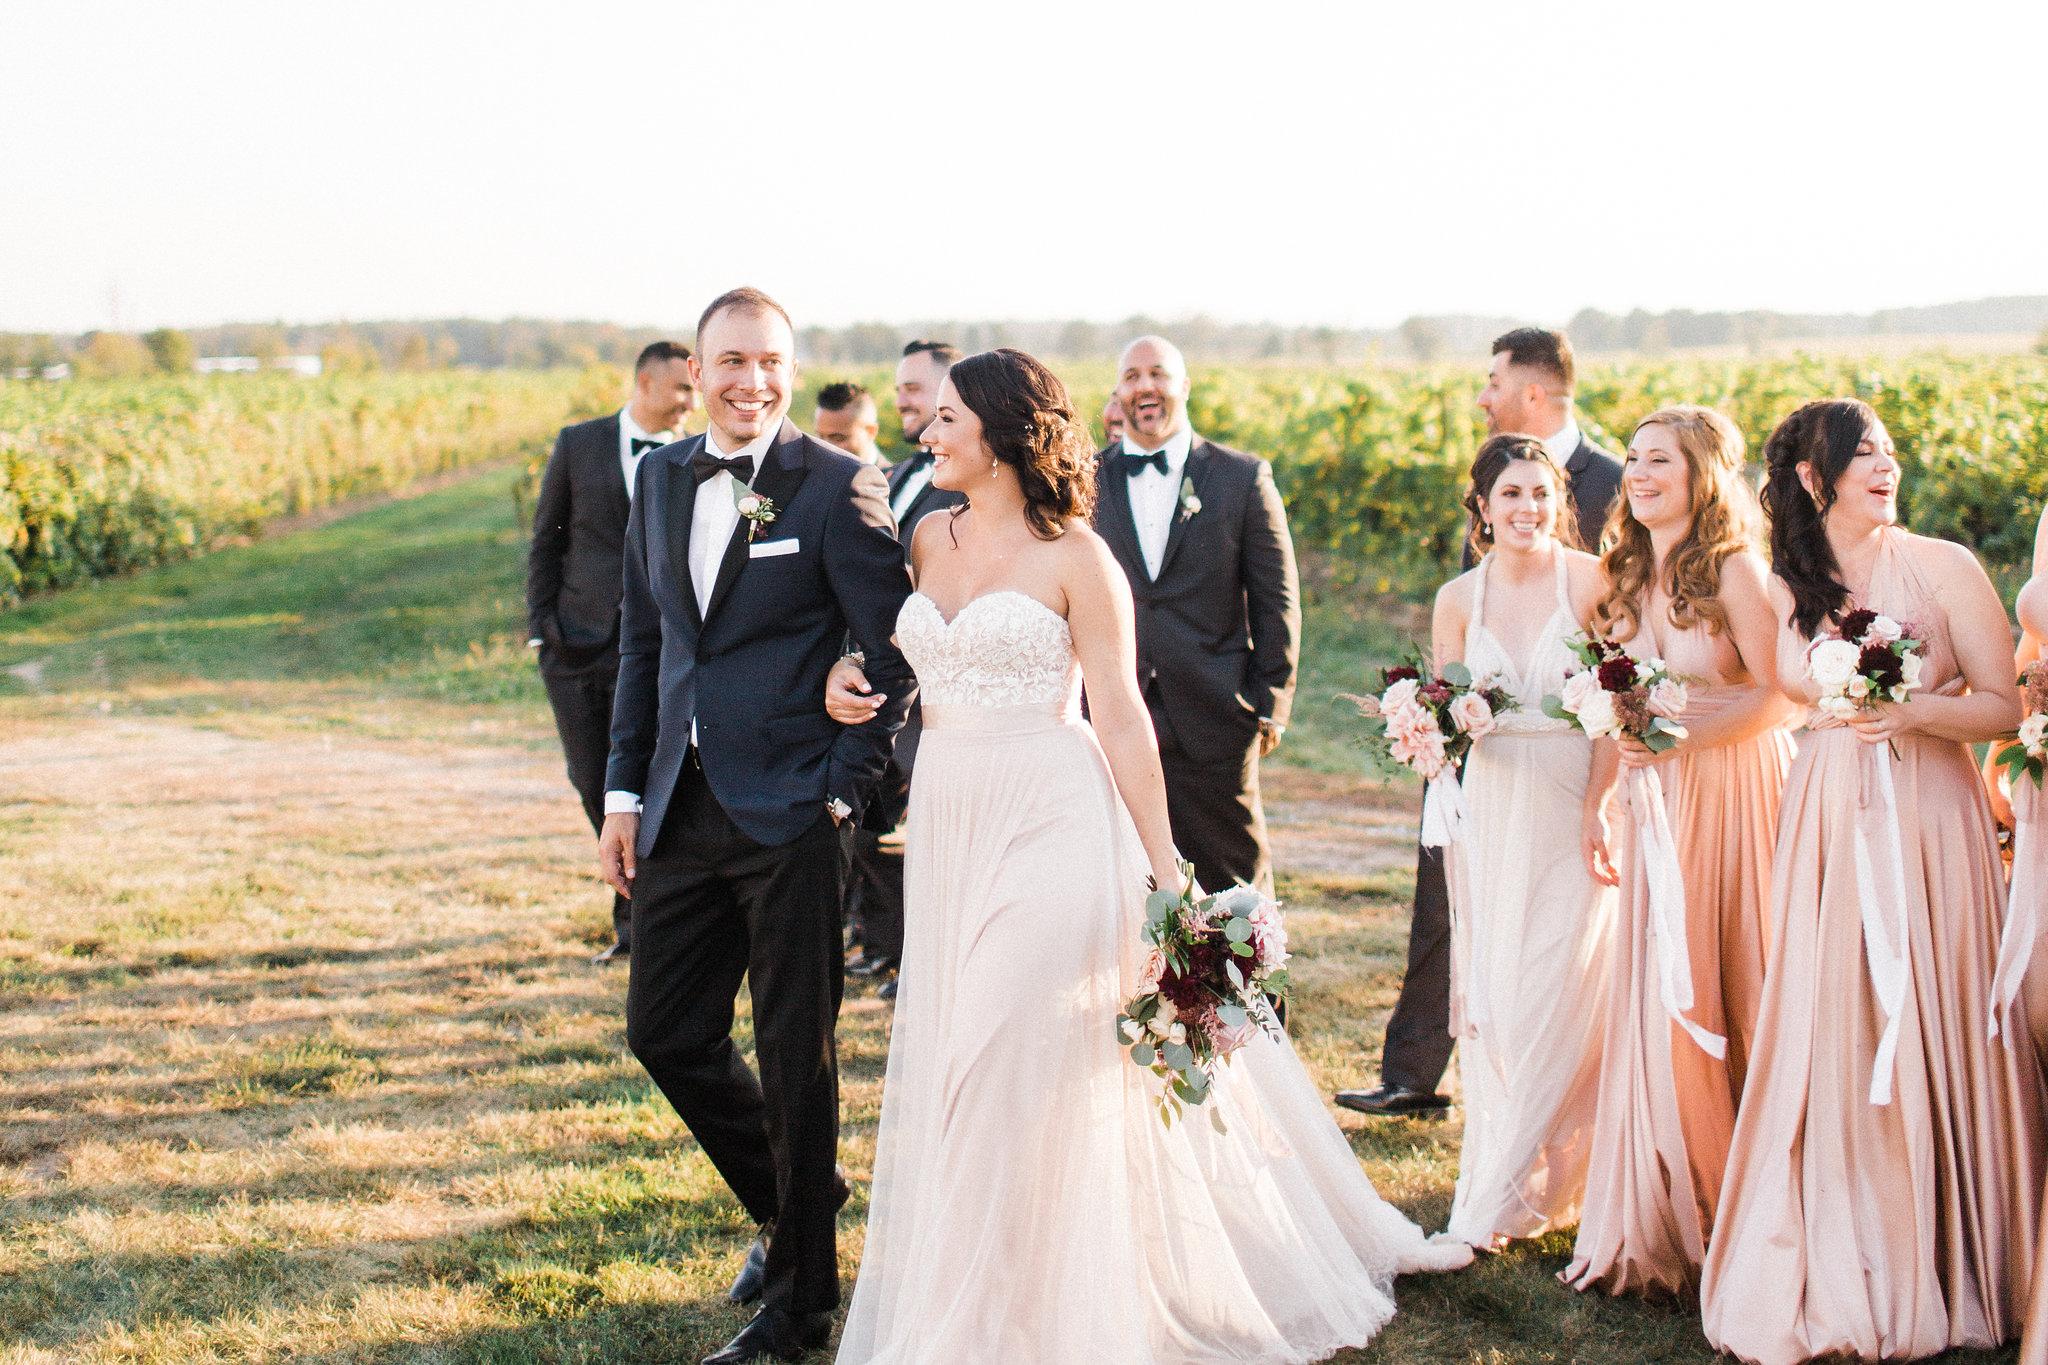 ksp_Ashleigh&Cameron_married-827.jpg